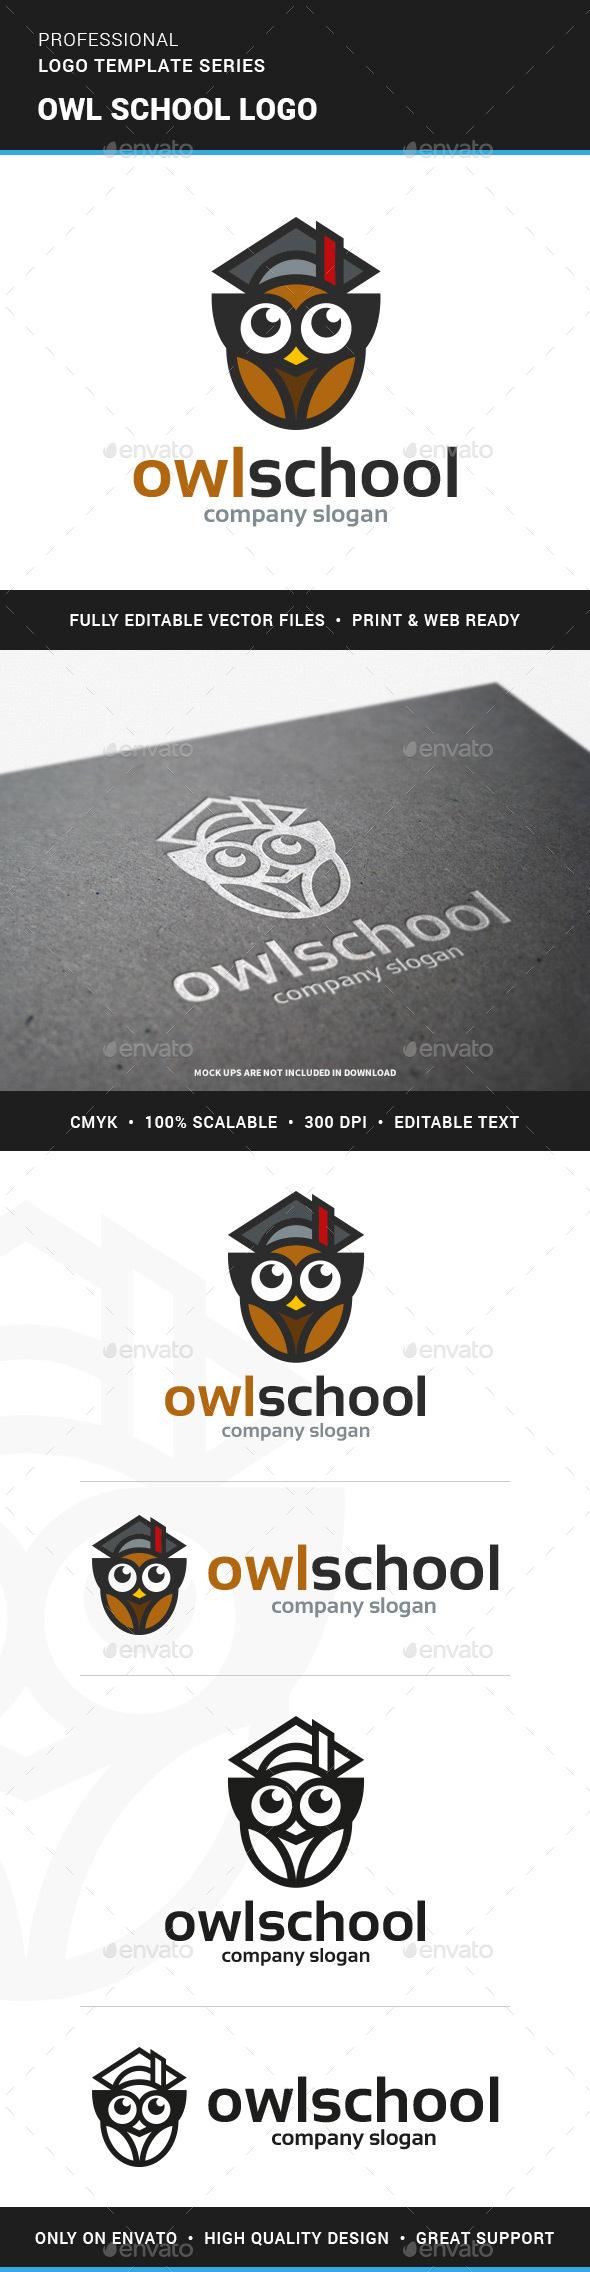 Owl School Logo Template - Animals Logo Templates